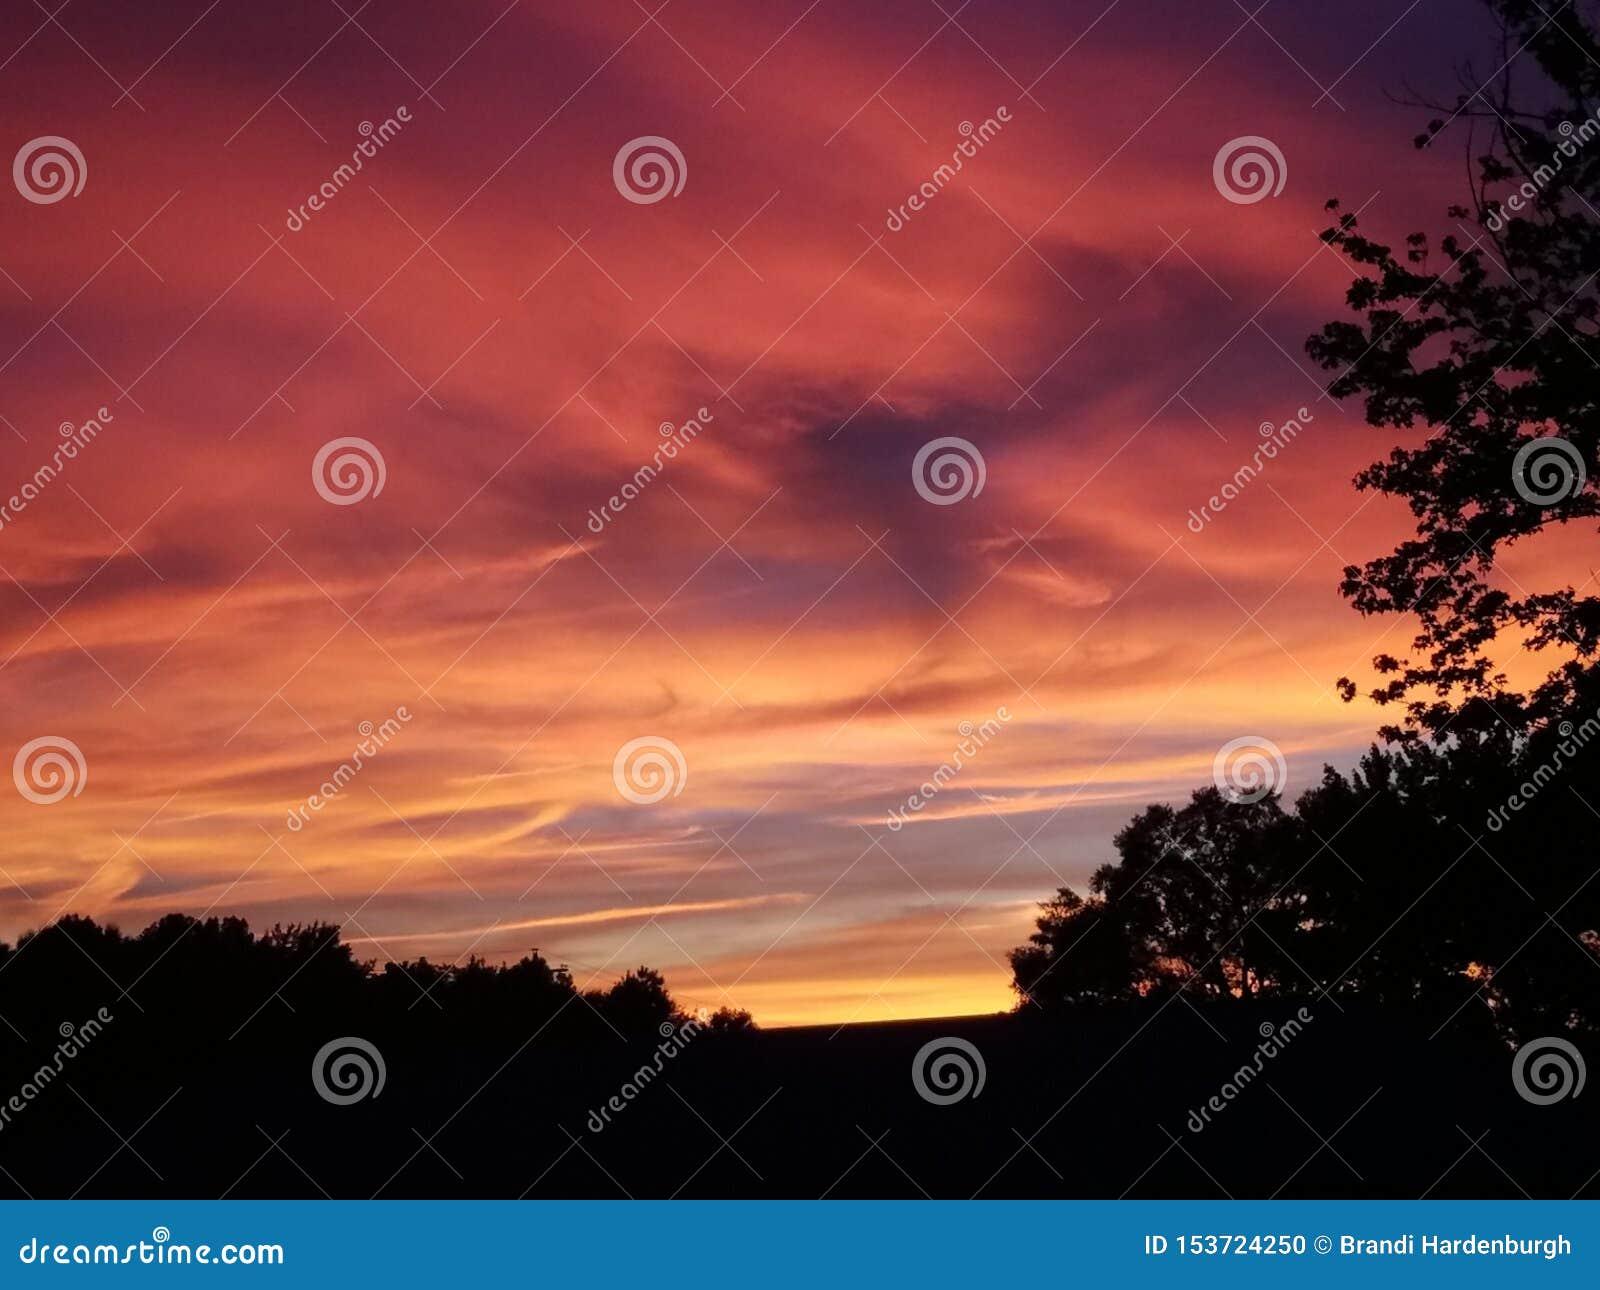 Lion King Sunset Stock Photo Image Of Colors Sunset